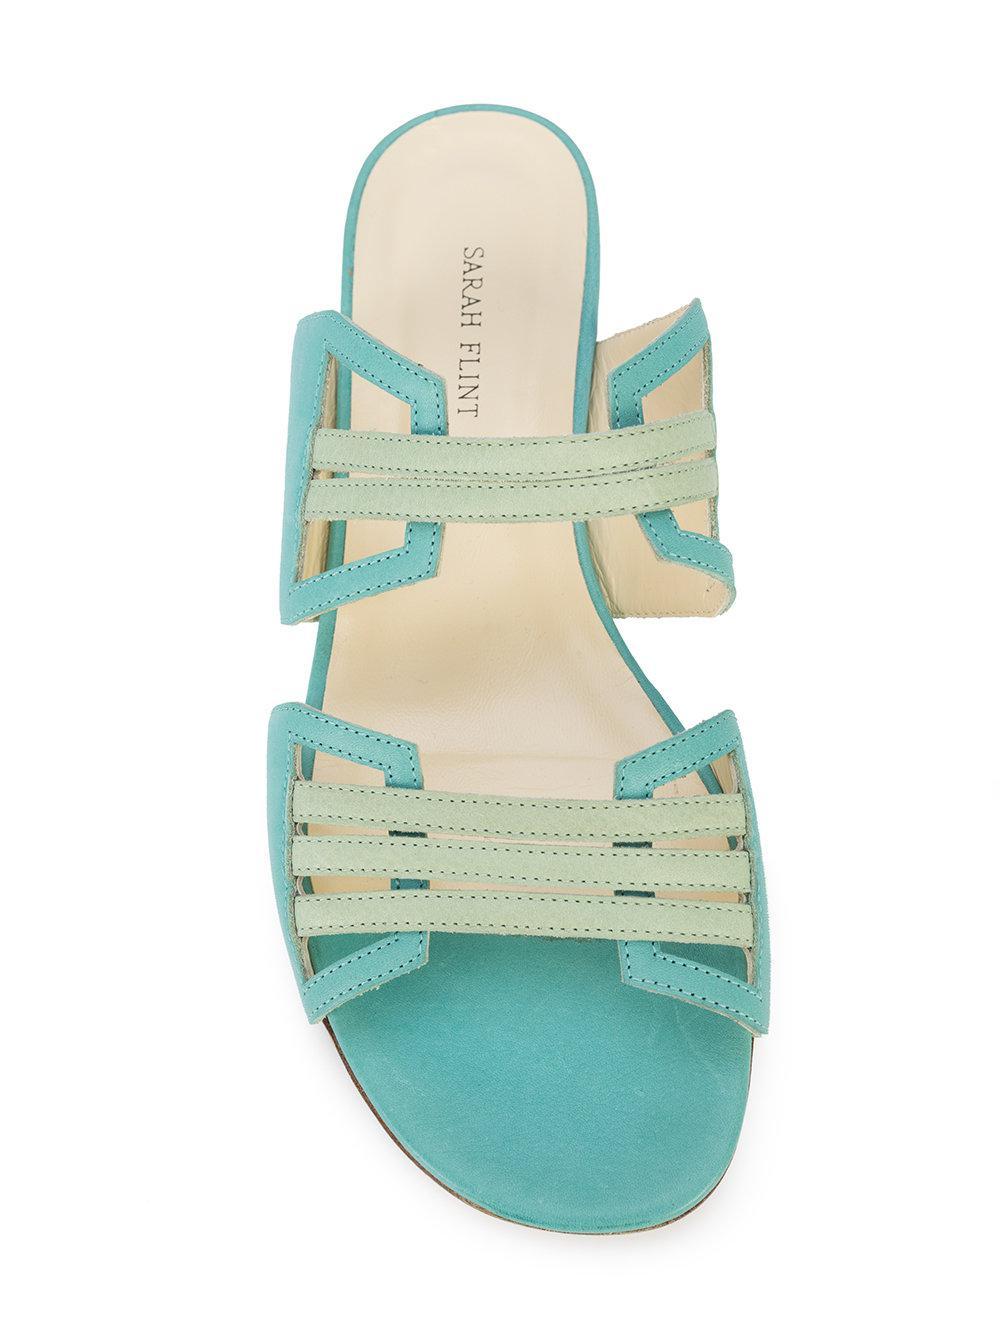 Bailey sandals - Blue Sarah Flint 4D8cDp